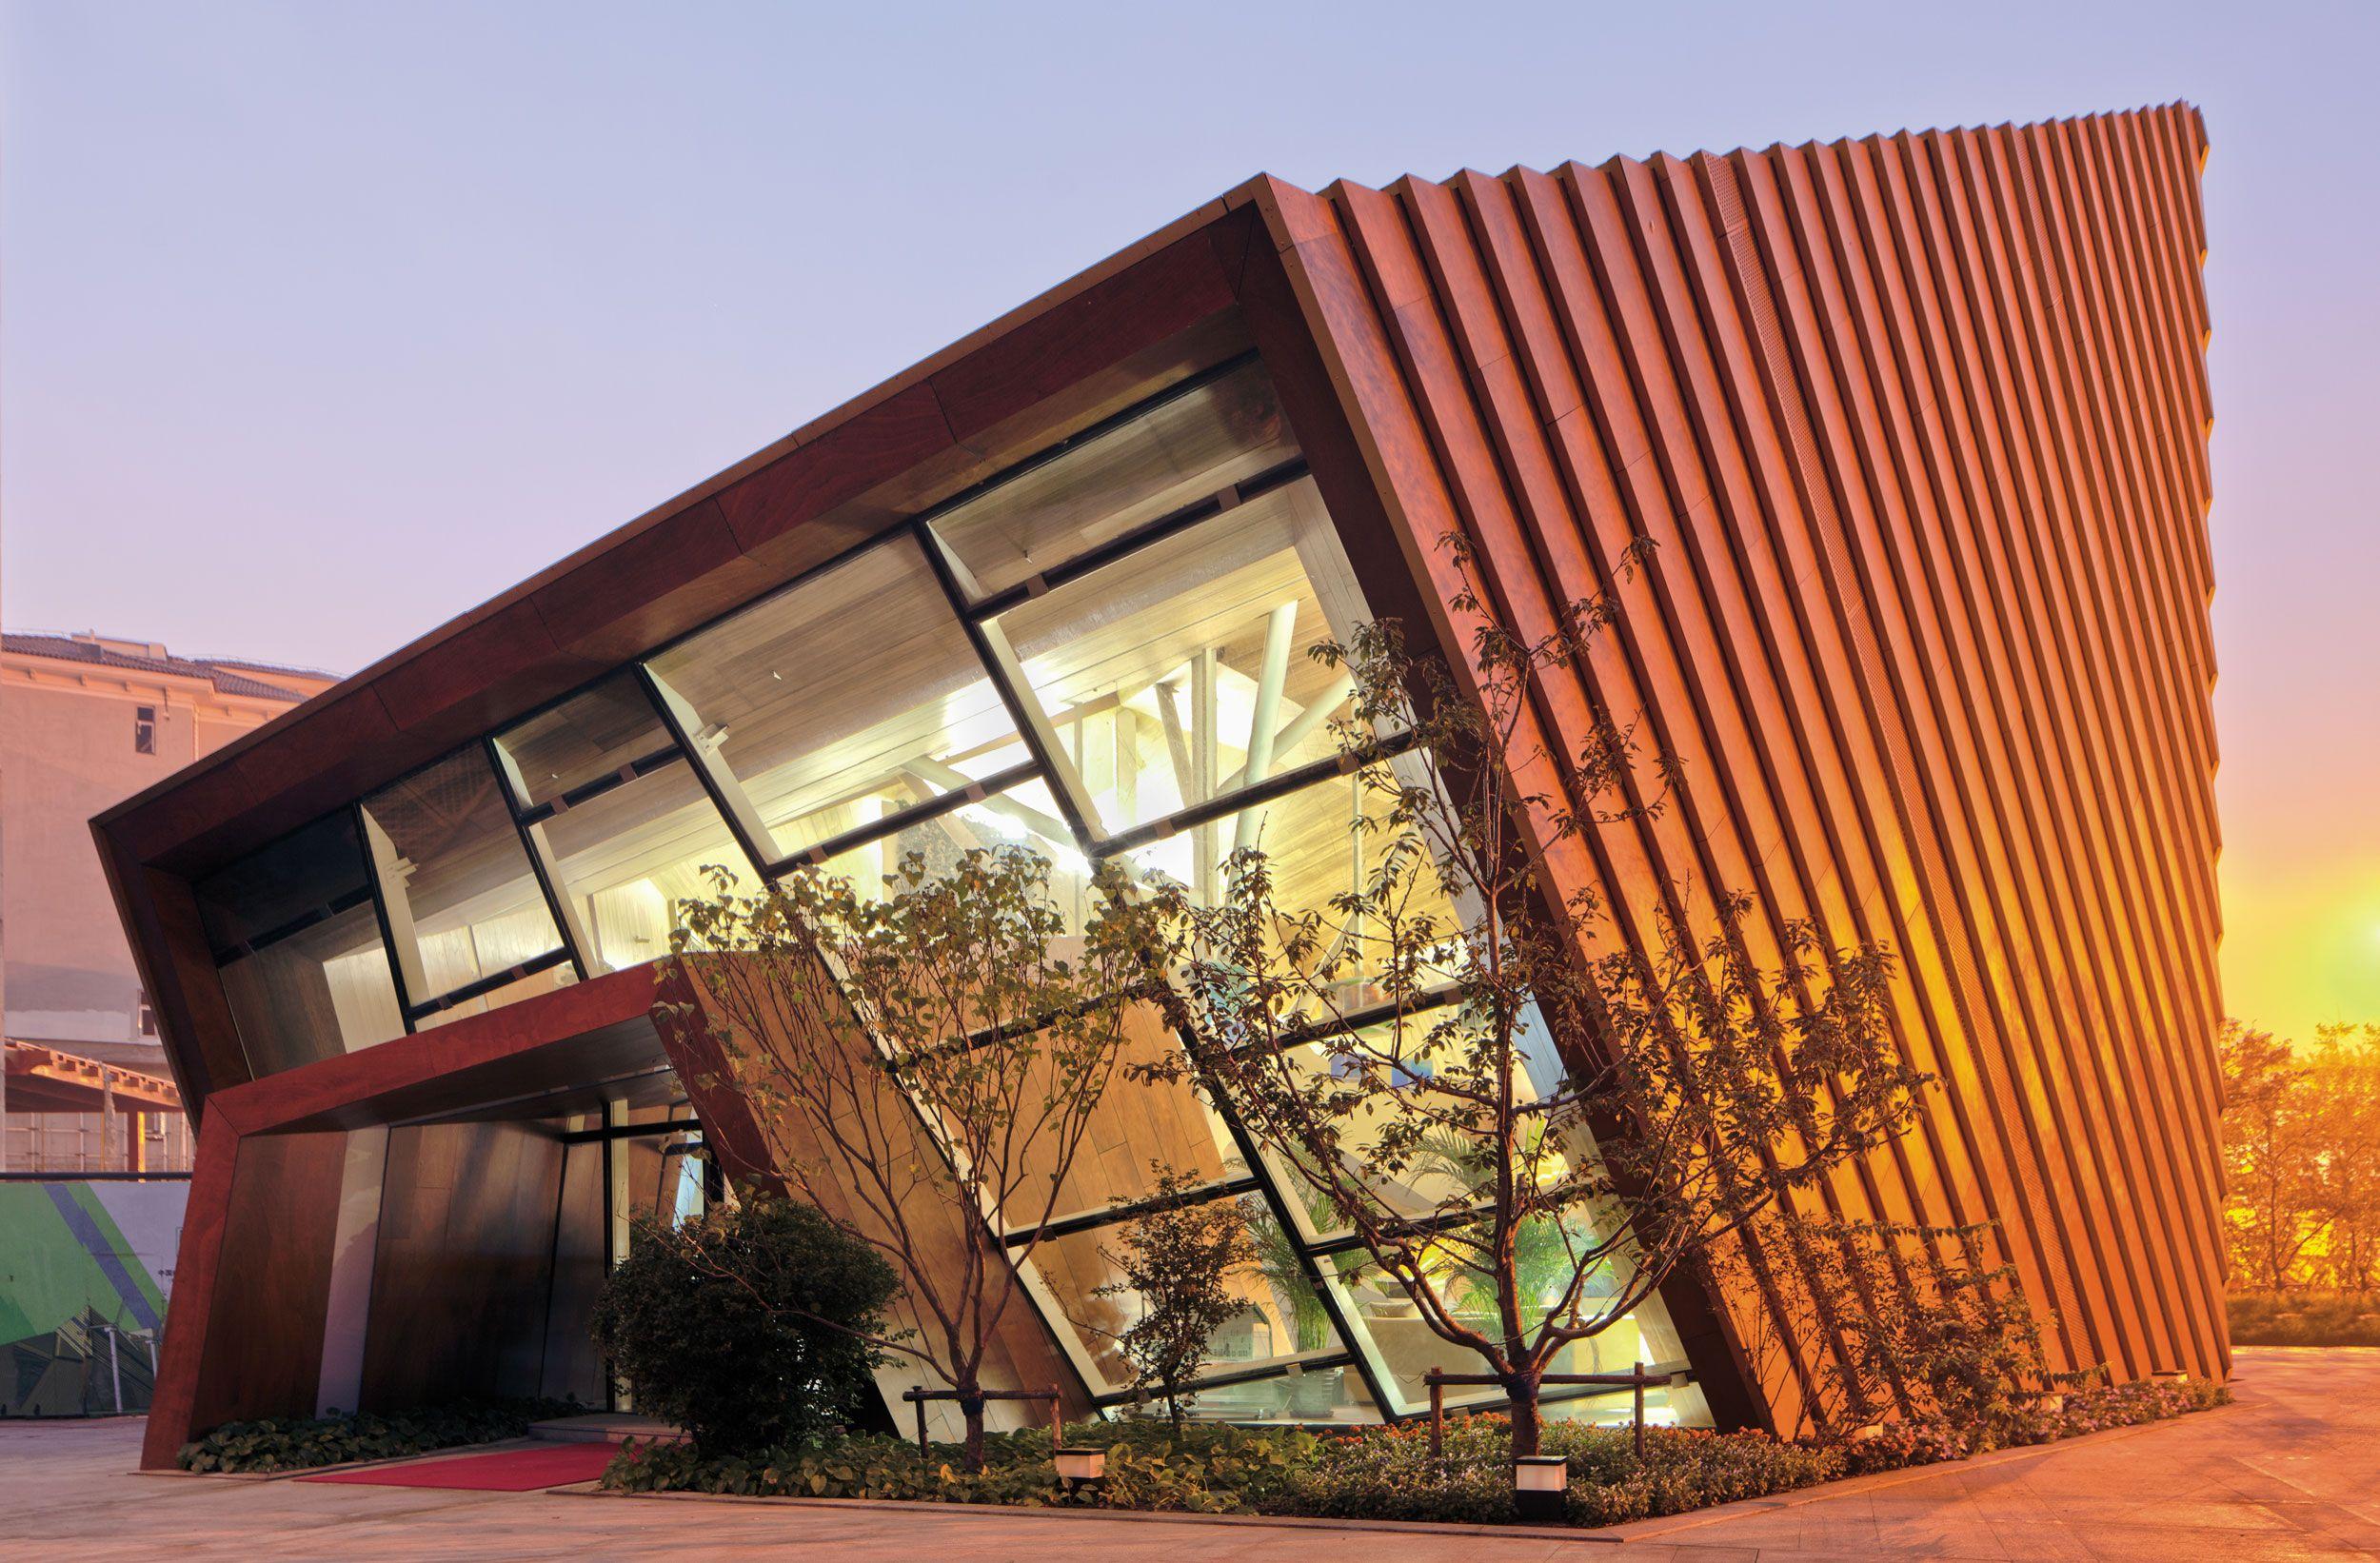 Cocoon Community Center Vantone EcoCity Legacy Homes